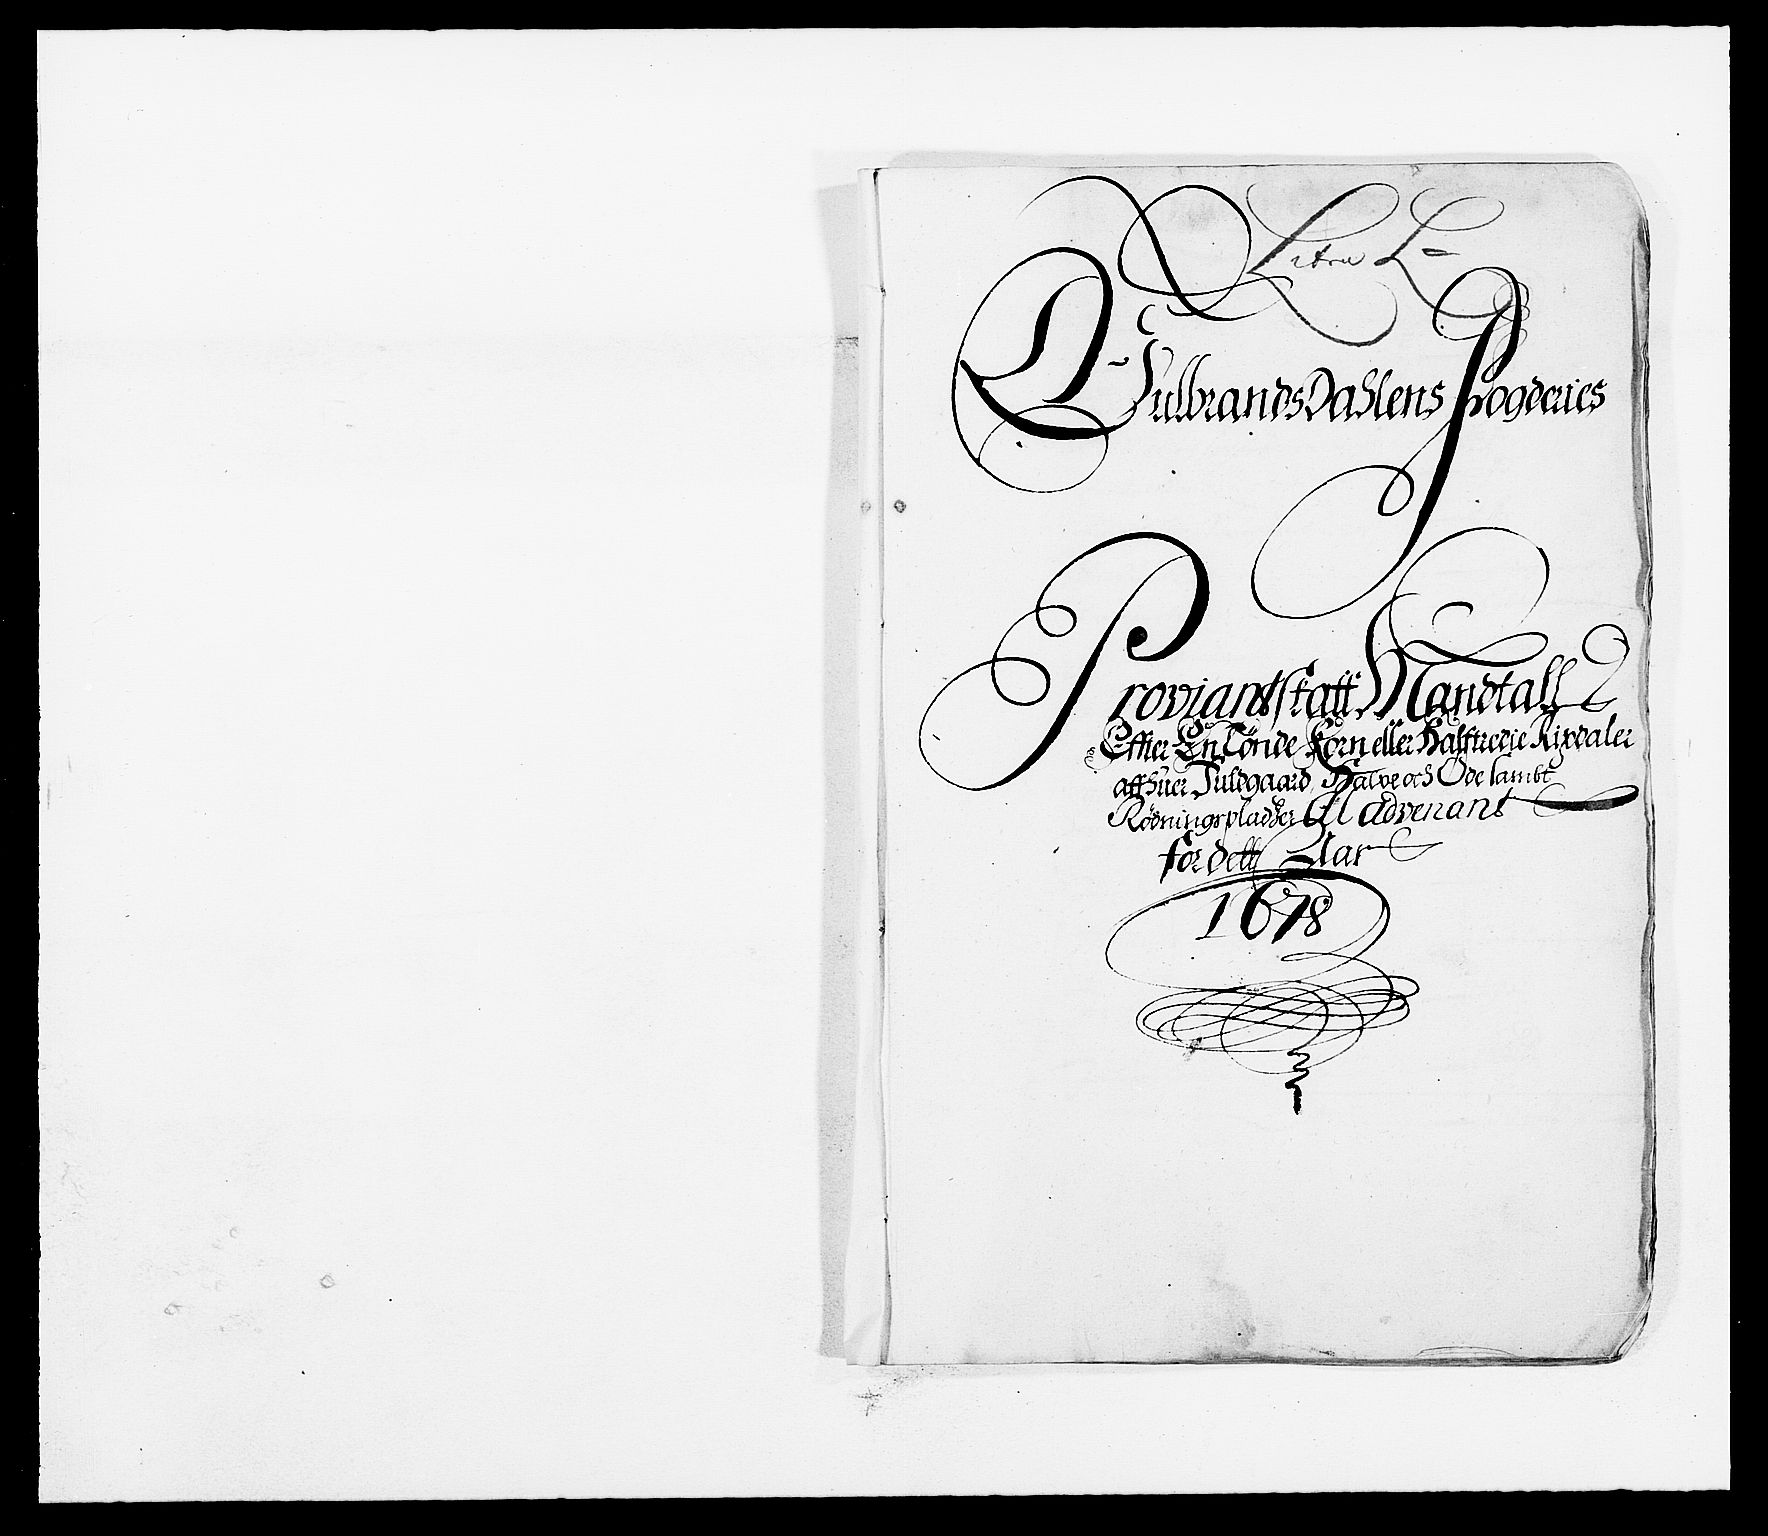 RA, Rentekammeret inntil 1814, Reviderte regnskaper, Fogderegnskap, R17/L1152: Fogderegnskap Gudbrandsdal, 1678-1679, s. 376